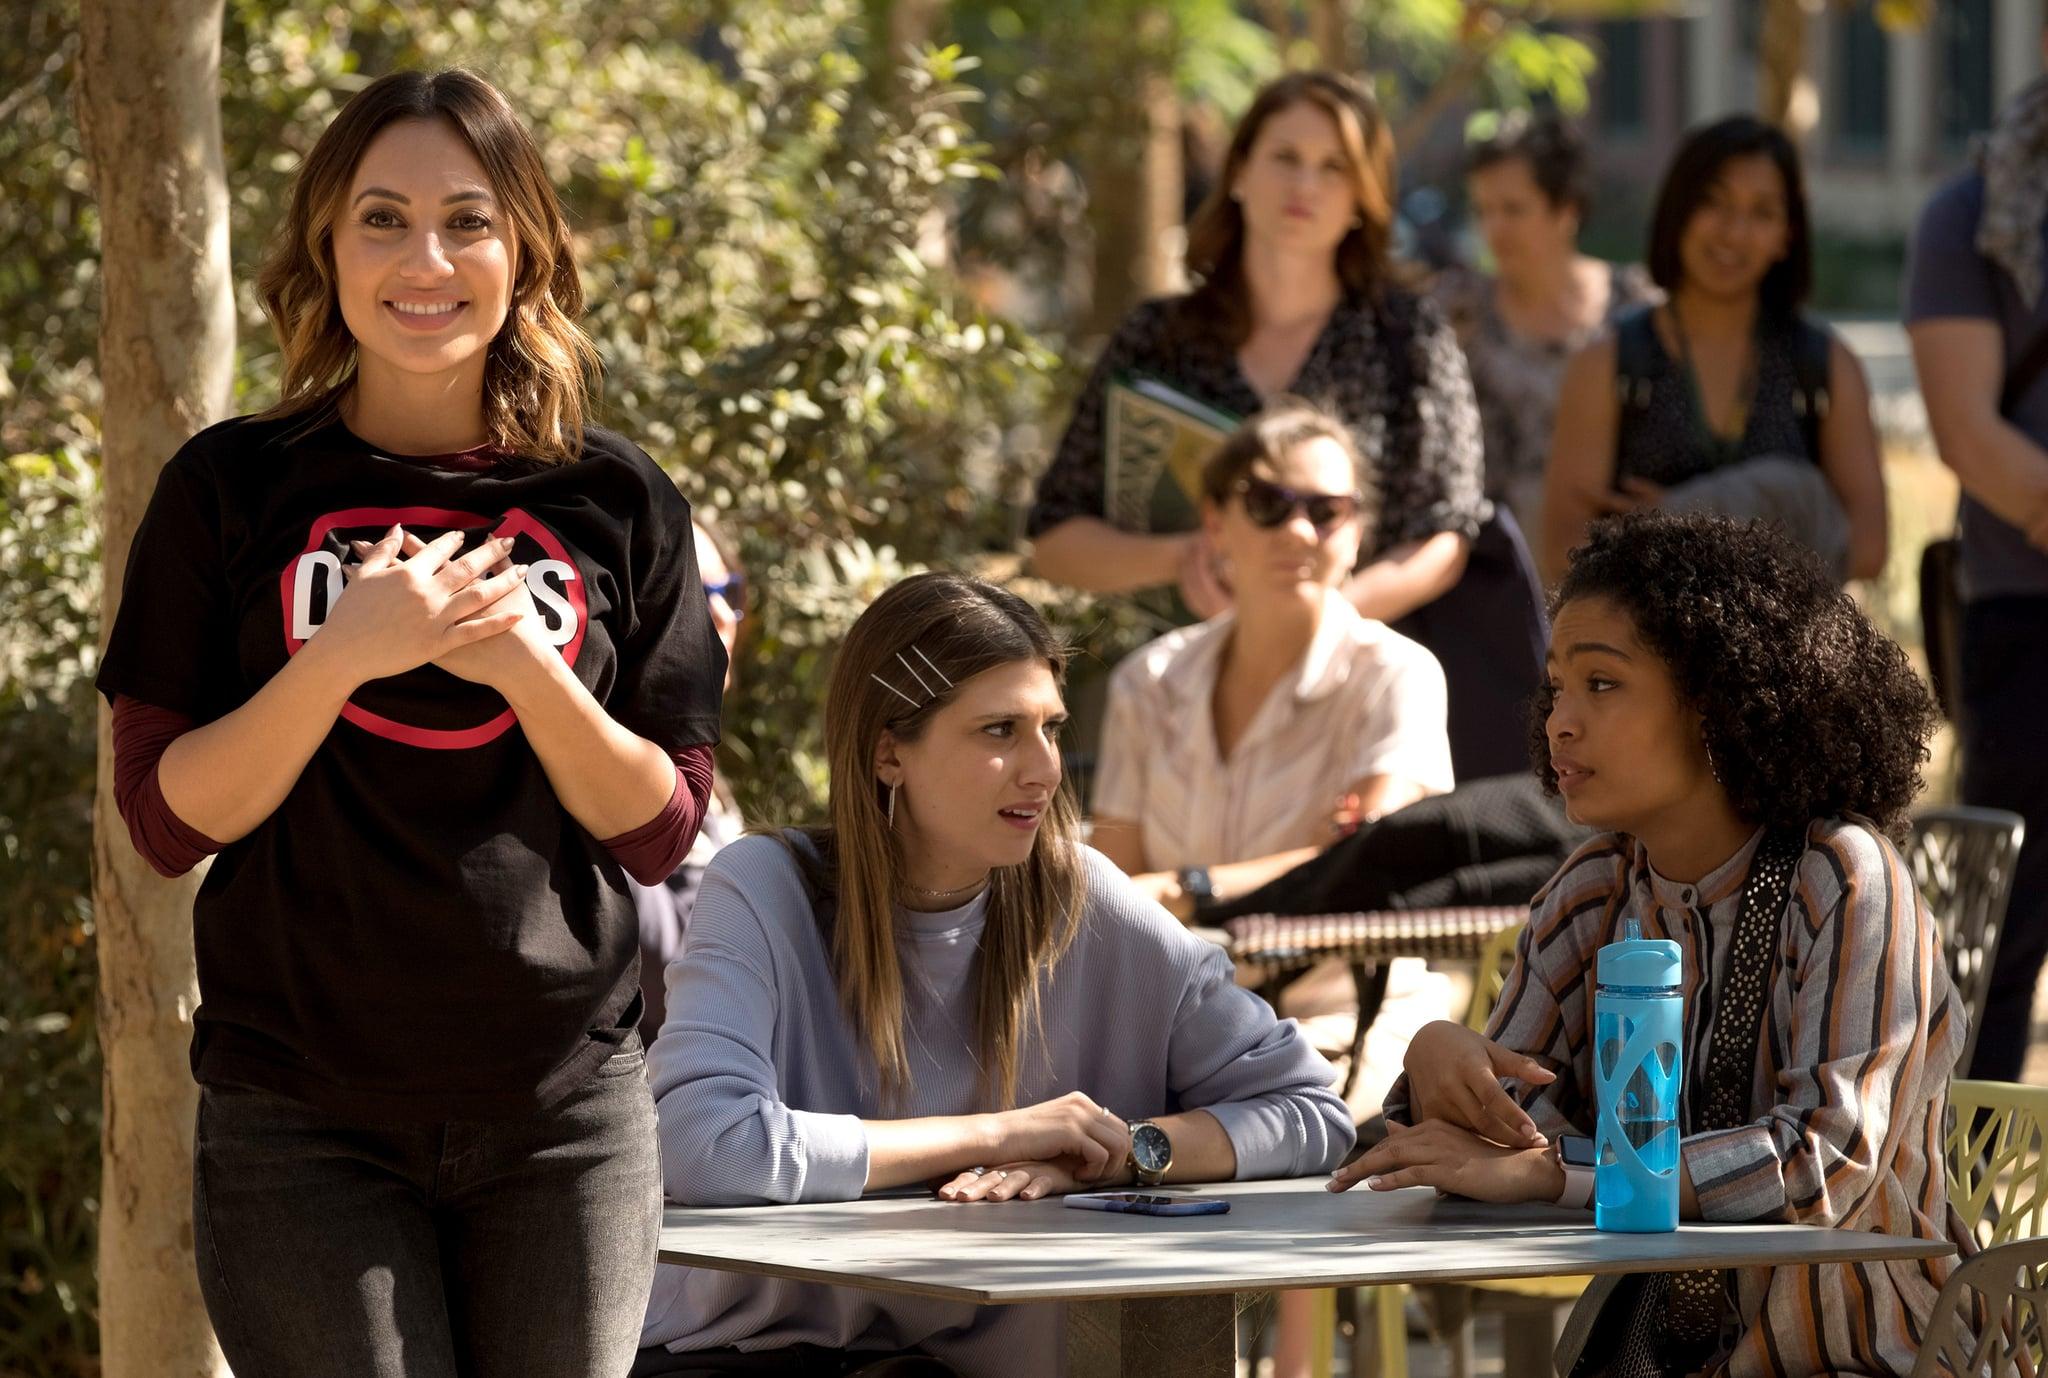 GROWN-ISH, l-r: Francia Raisa, Emily Arlook, Yara Shahidi in 'Who Gon Stop Me' (Season 1, Episode 9, aired February 28, 2018). ph: Tony Rivetti/ Freeform/courtesy Everett Collection